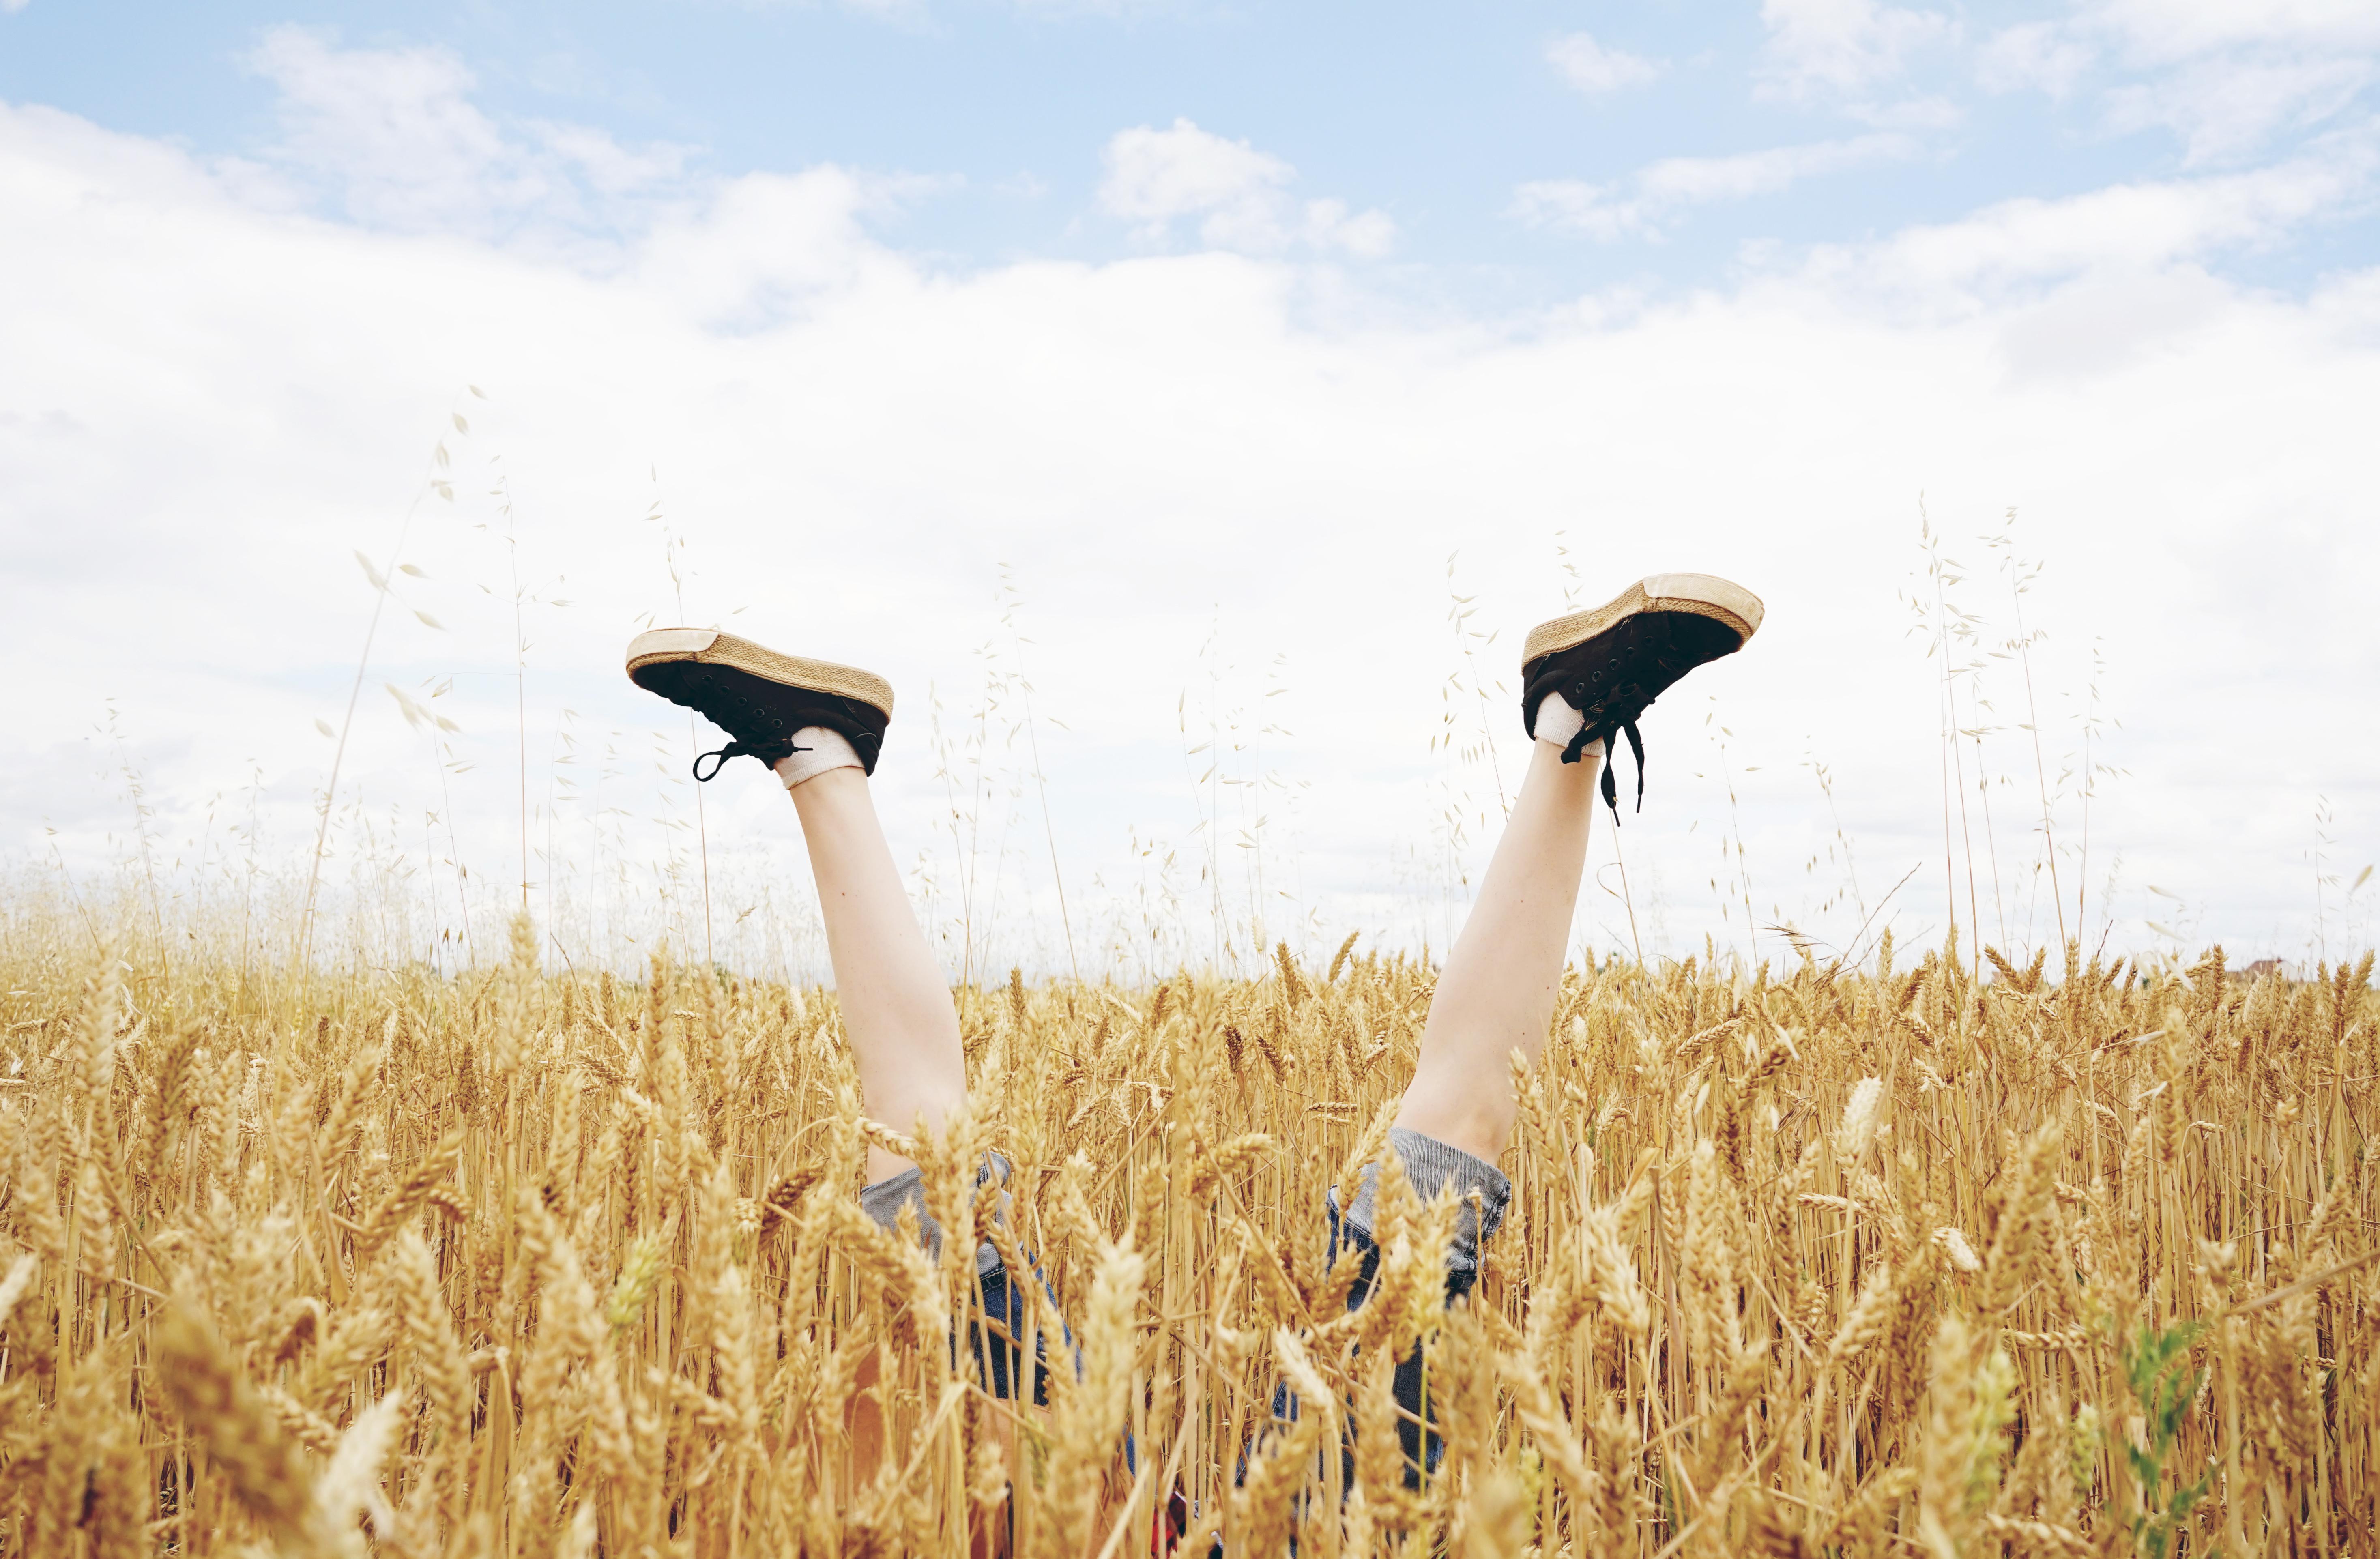 Piernas asomando por encima de un campo de trigo